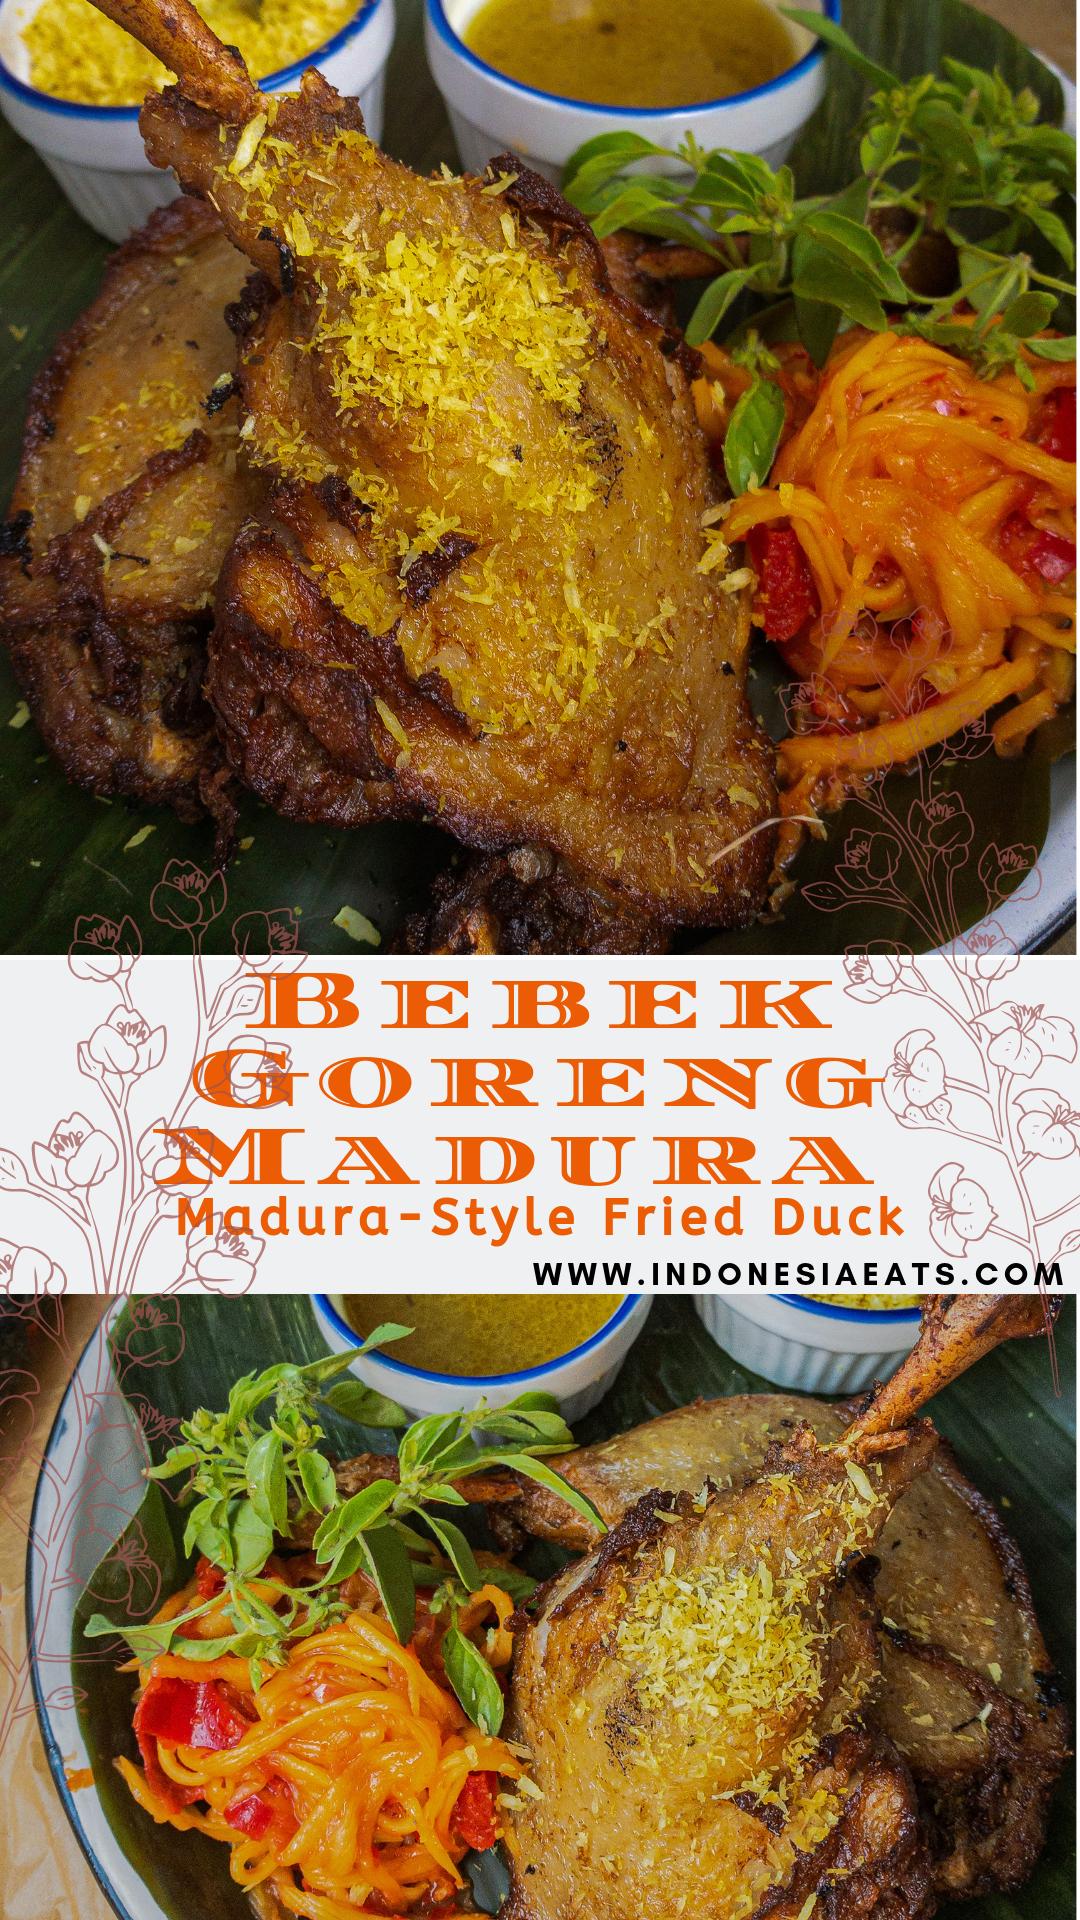 Bebek Goreng Png : bebek, goreng, These, Fried, Ducks, Bebek, Goreng, Madura, GOOD!, Instapot, Quicken, Cooking, Process., #indonesianfood, #inst…, Recipes,, Indonesian, Food,, Bacon